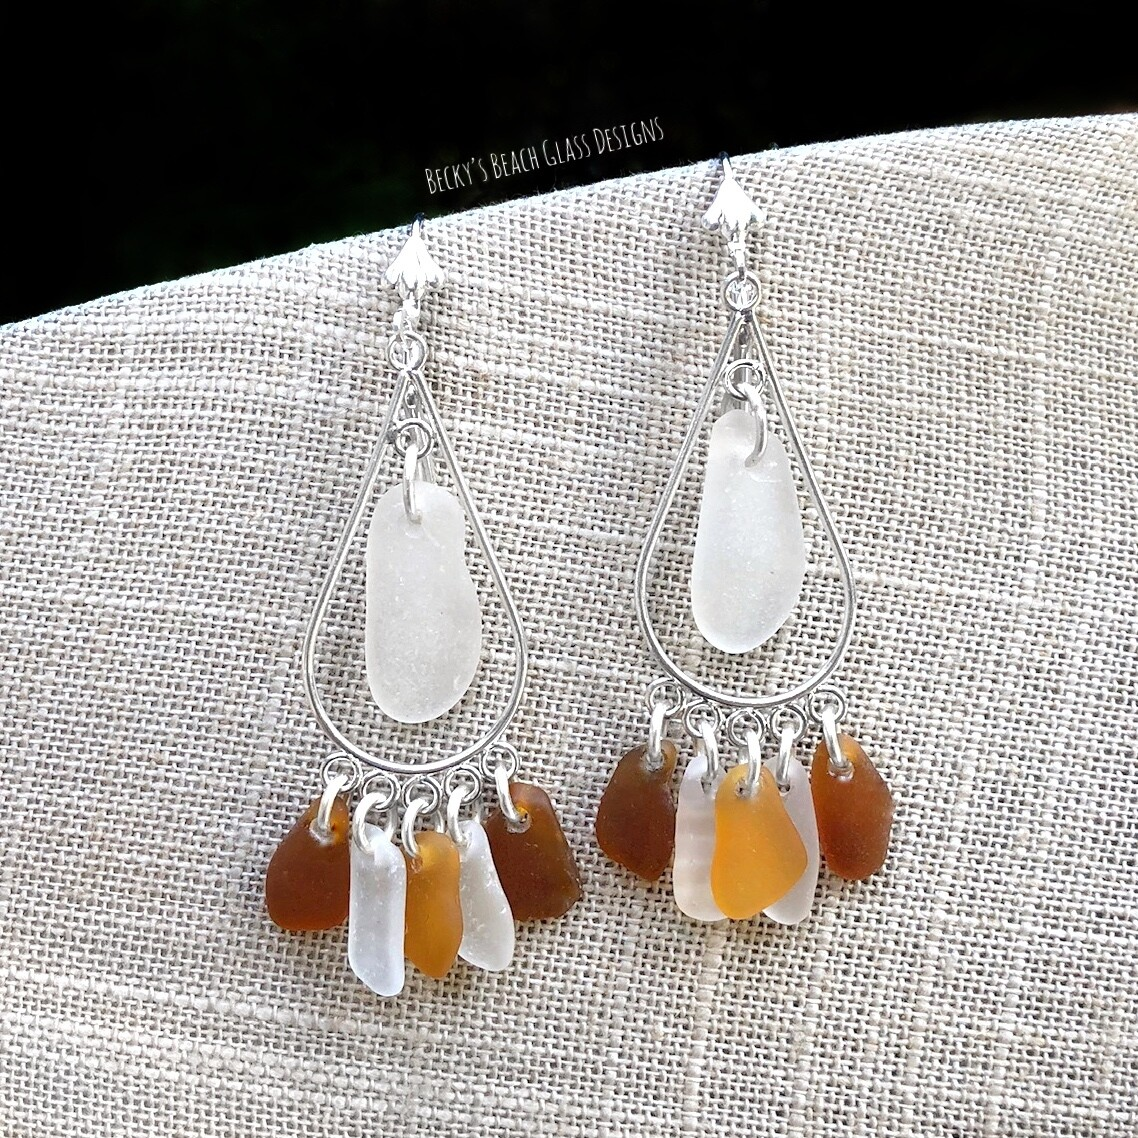 Amber, Brown, & White Sea Glass Earrings